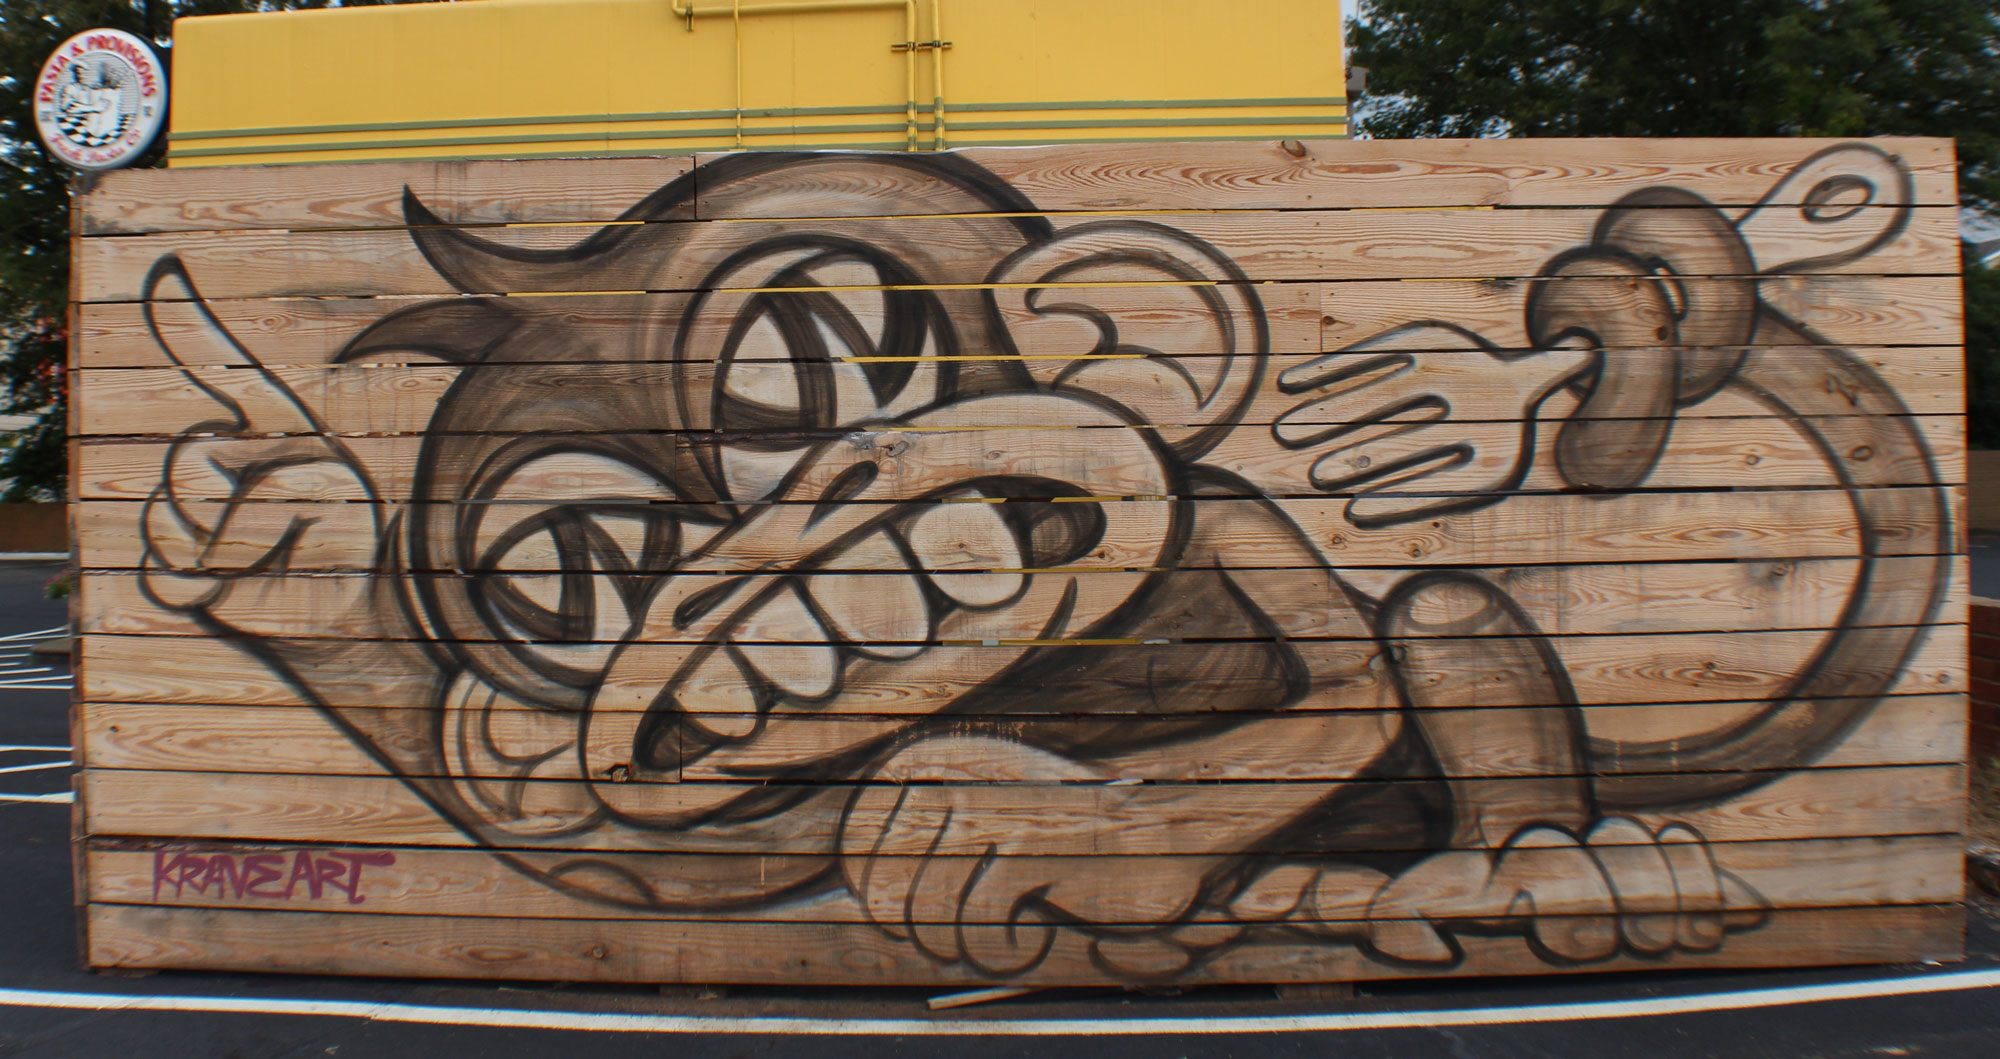 pasta_provisions_park_angry_monkey_krave-art.jpg